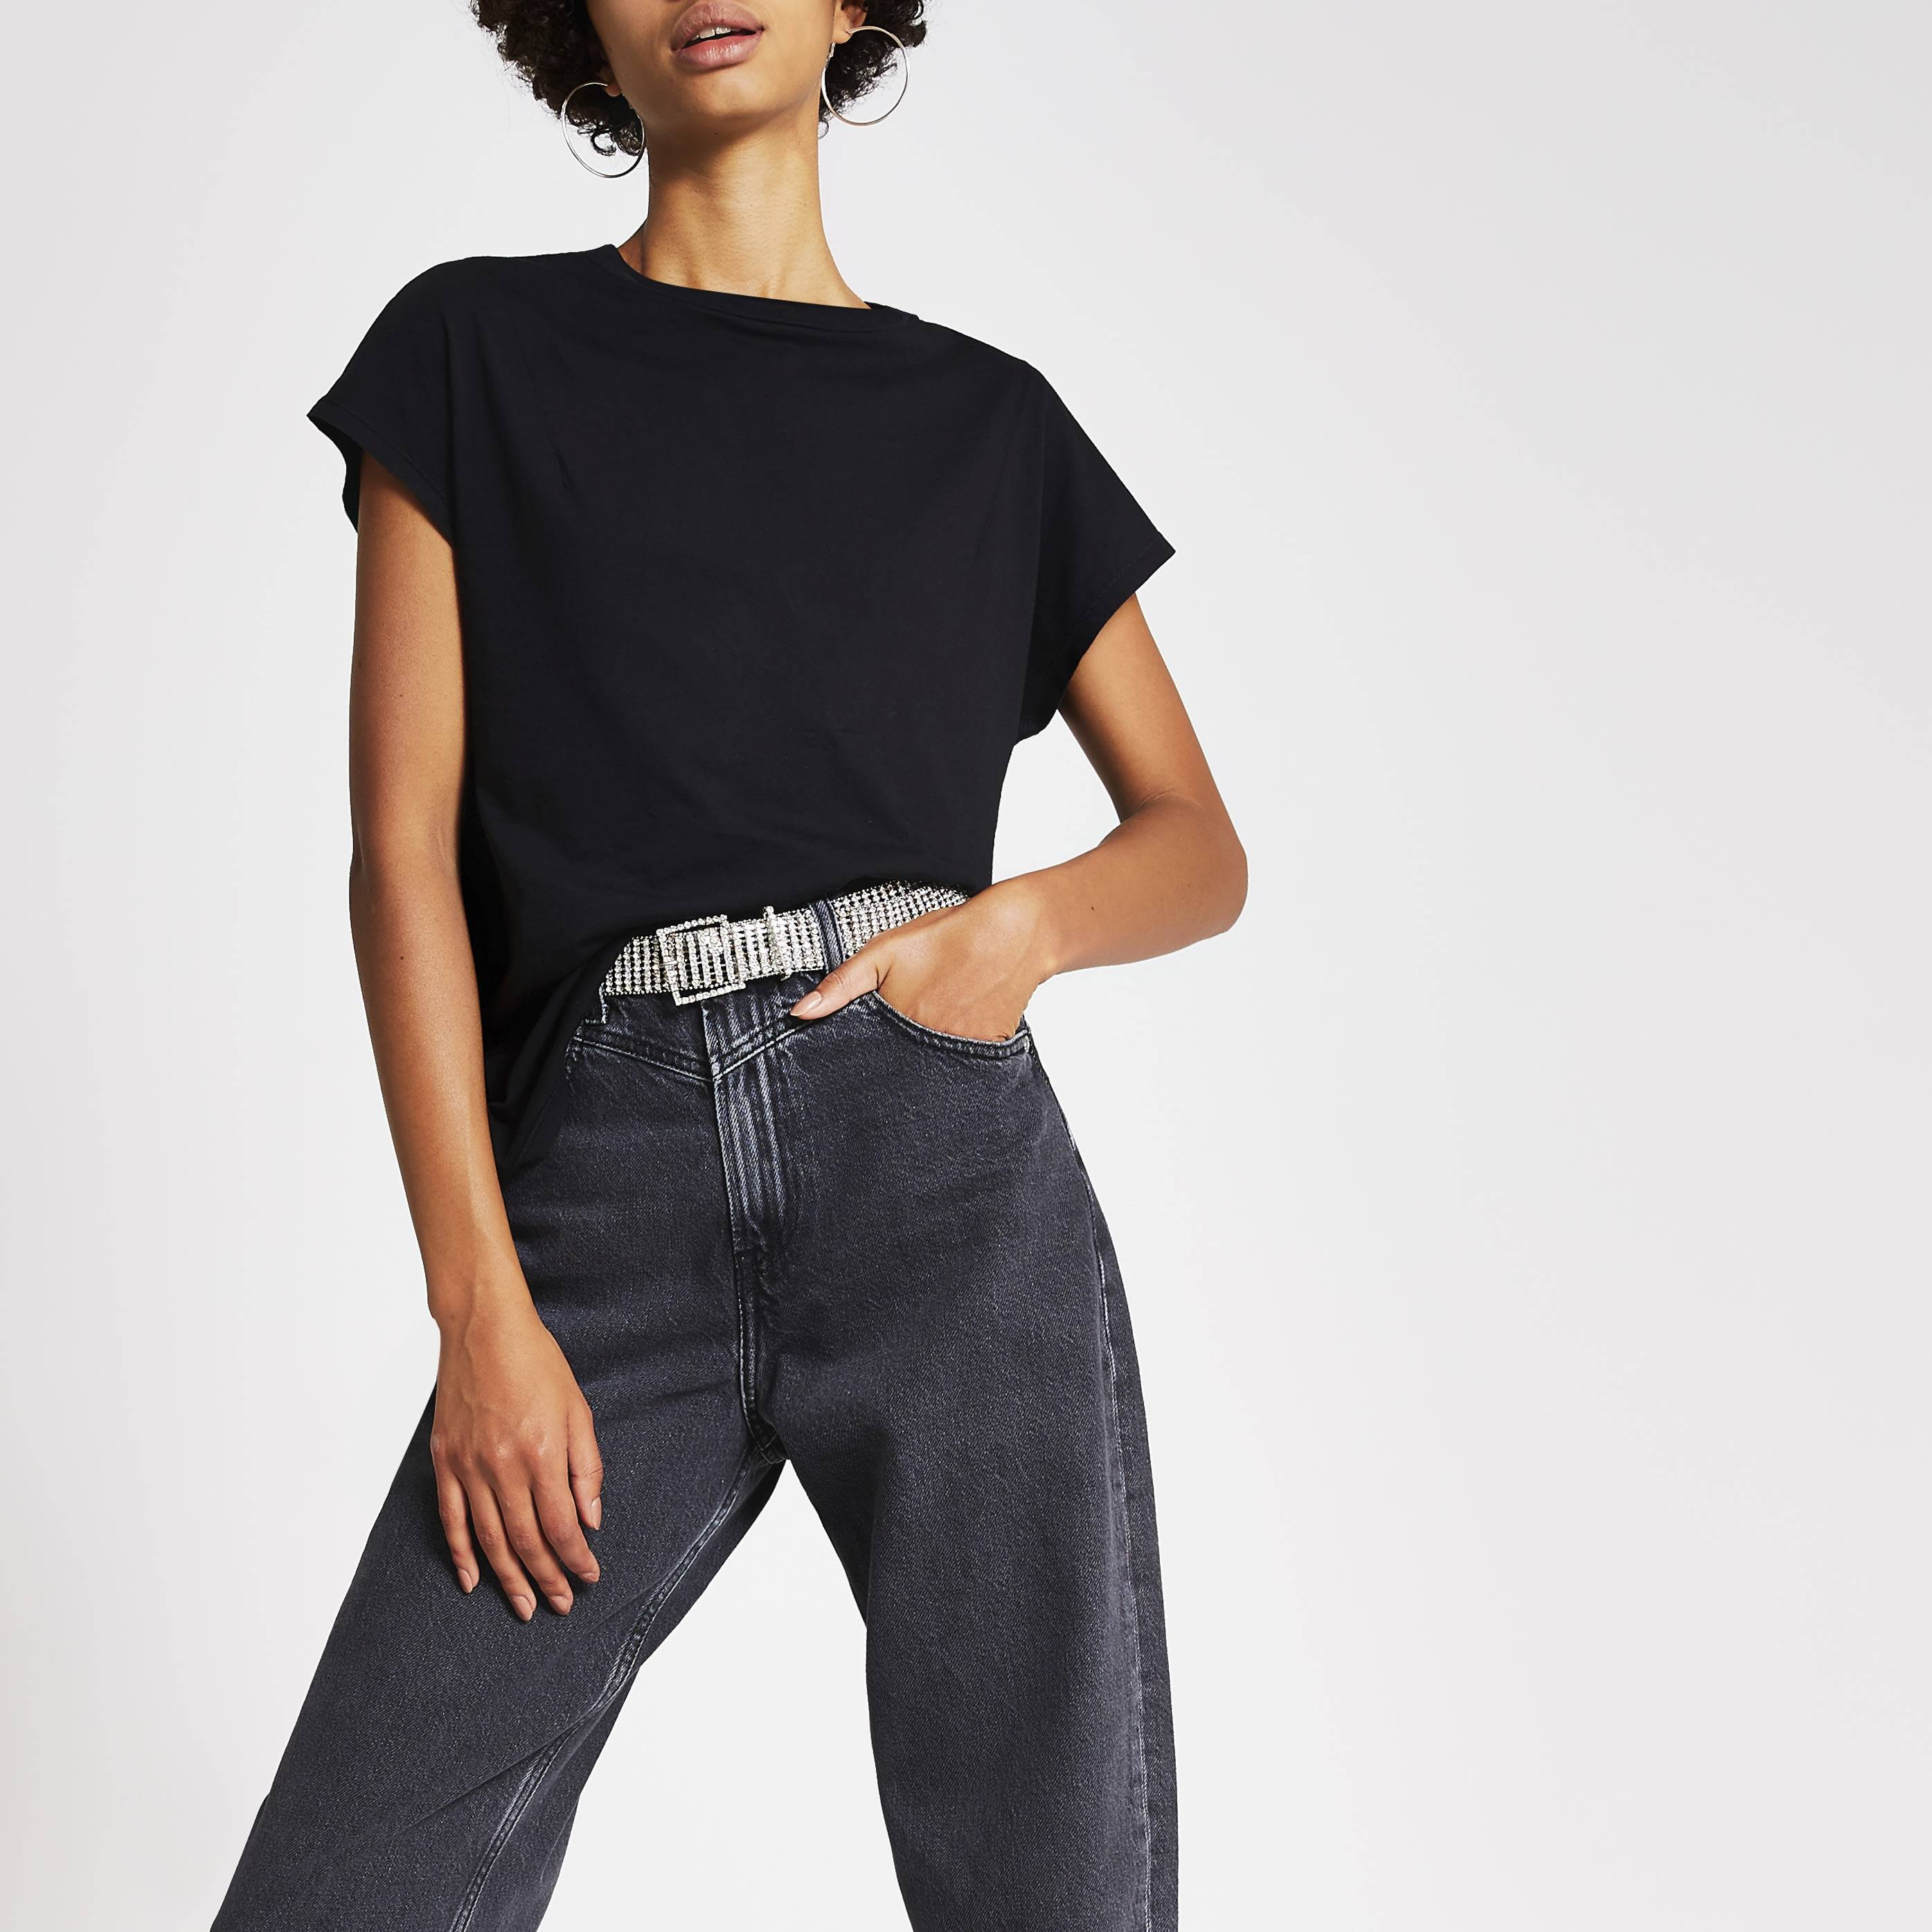 River Island Womens Dua Lipa x Pepe Jeans Black T-shirt (S)